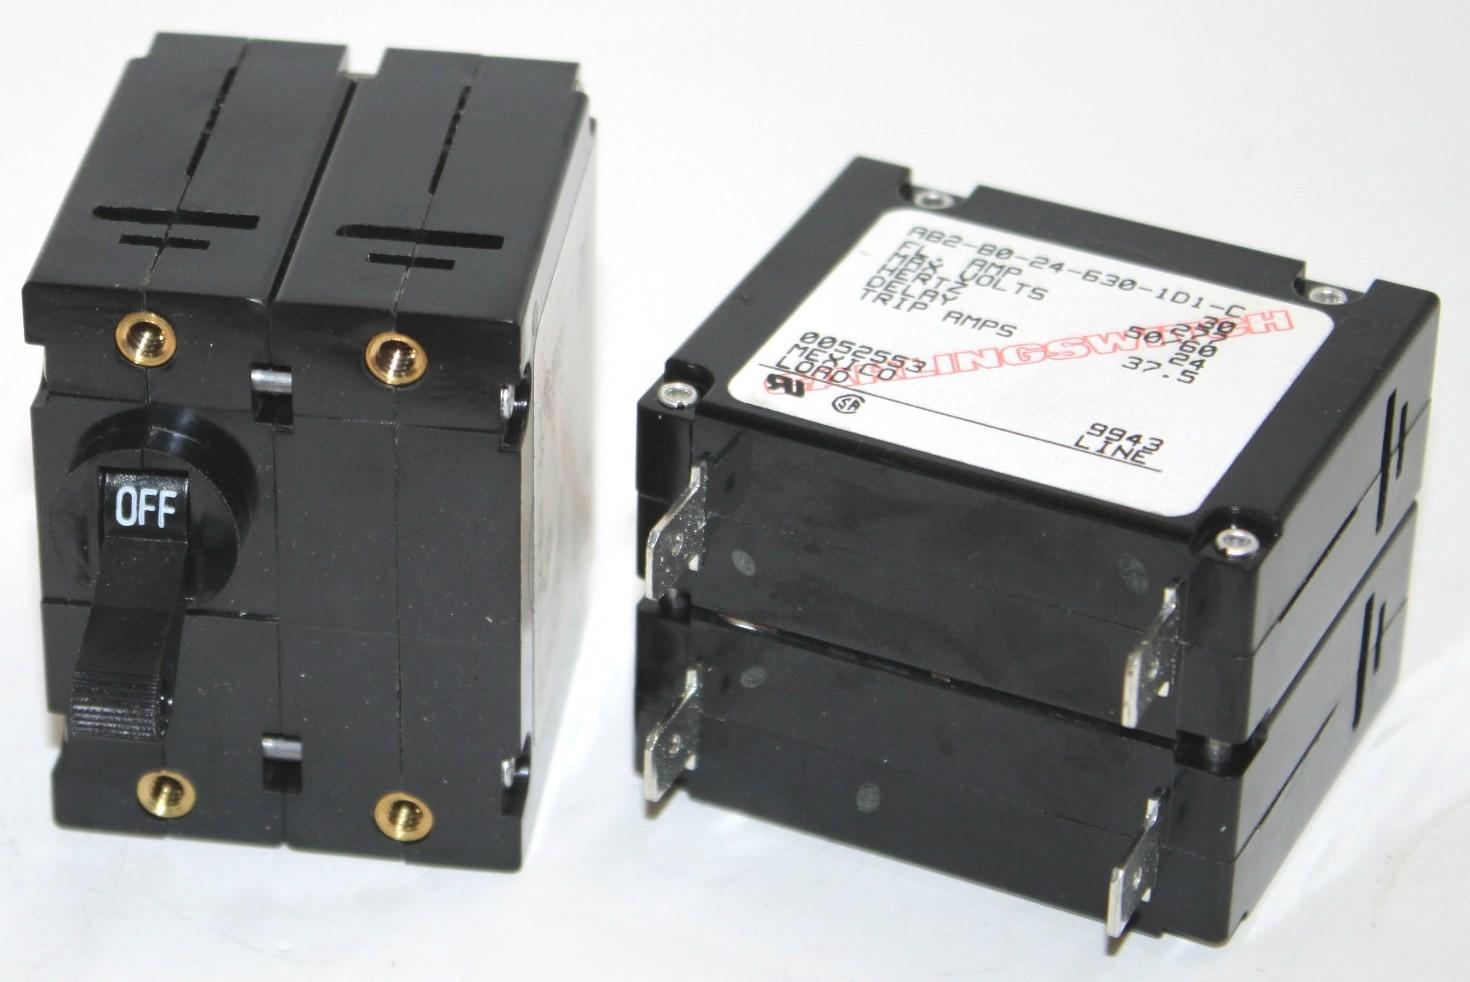 AB2-B0-24-630-1D1 Circuit Breaker, Dual AC, 30a, 277v, Carlingswitch